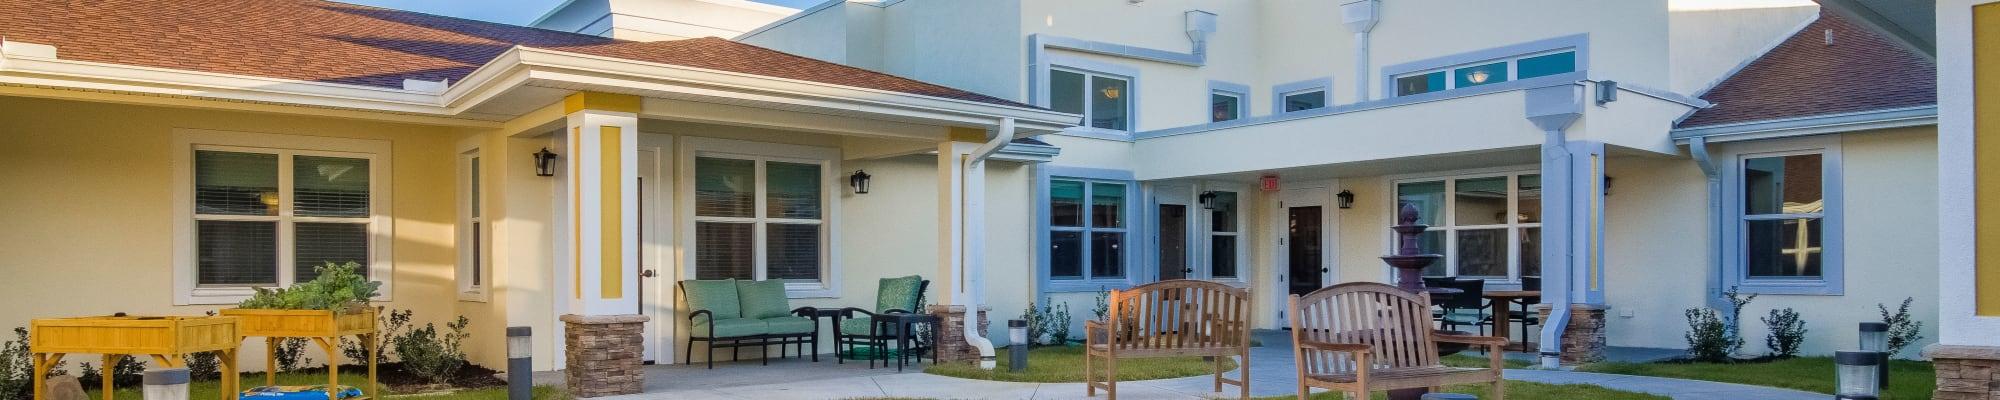 Our Community at CERTUS Premier Memory Care Living in Mount Dora, Florida.